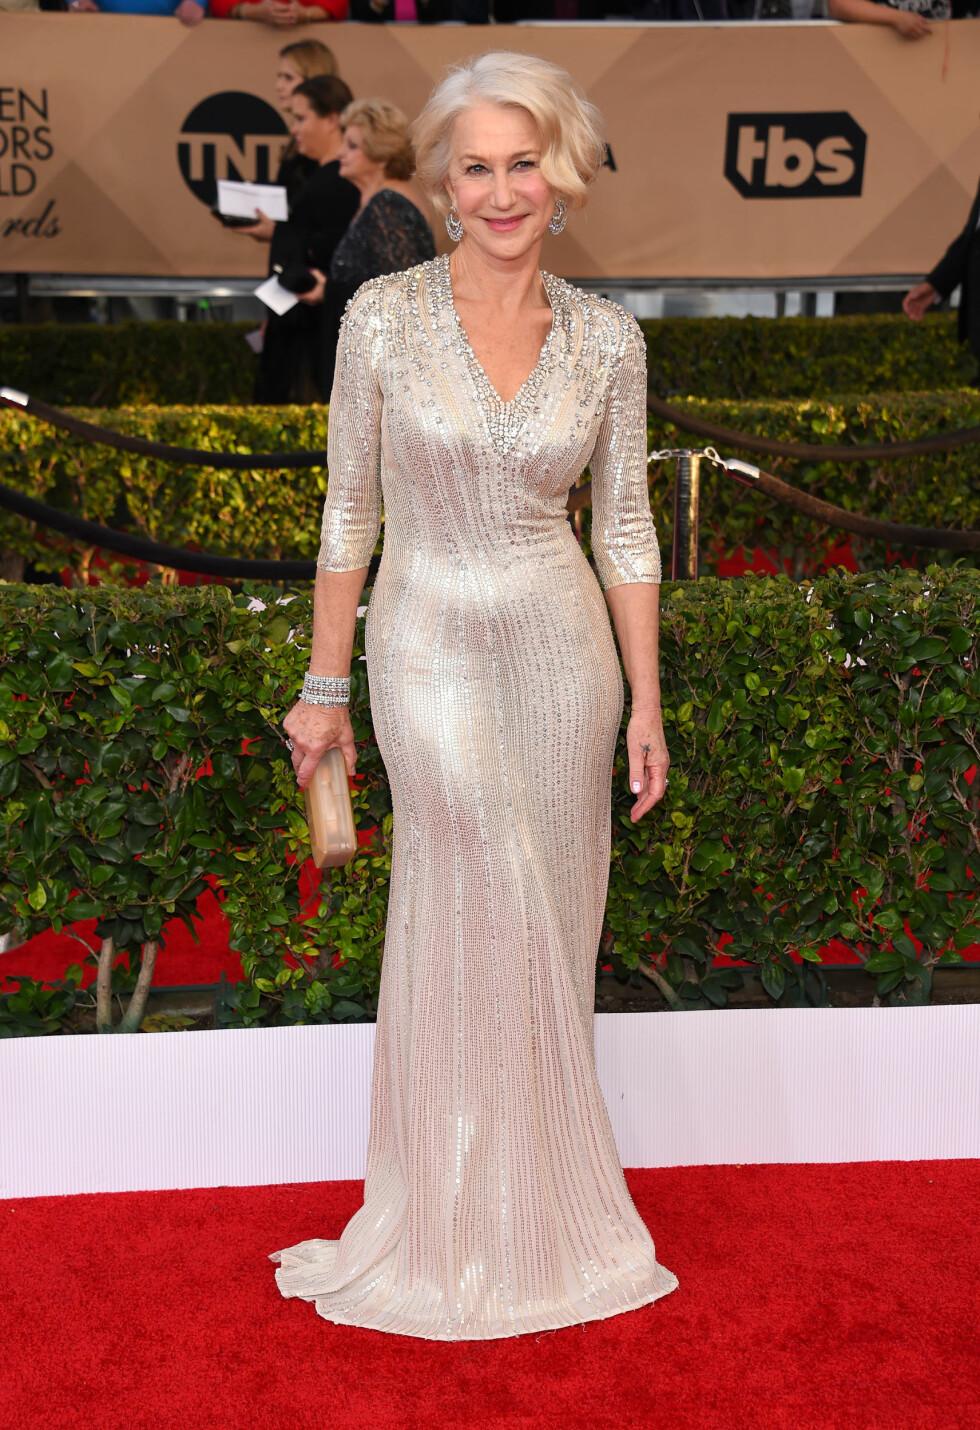 STRÅLTE I SØLV: Helen Mirren var lekker som alltid i paljettkjole i sølv.  Foto: Pa Photos